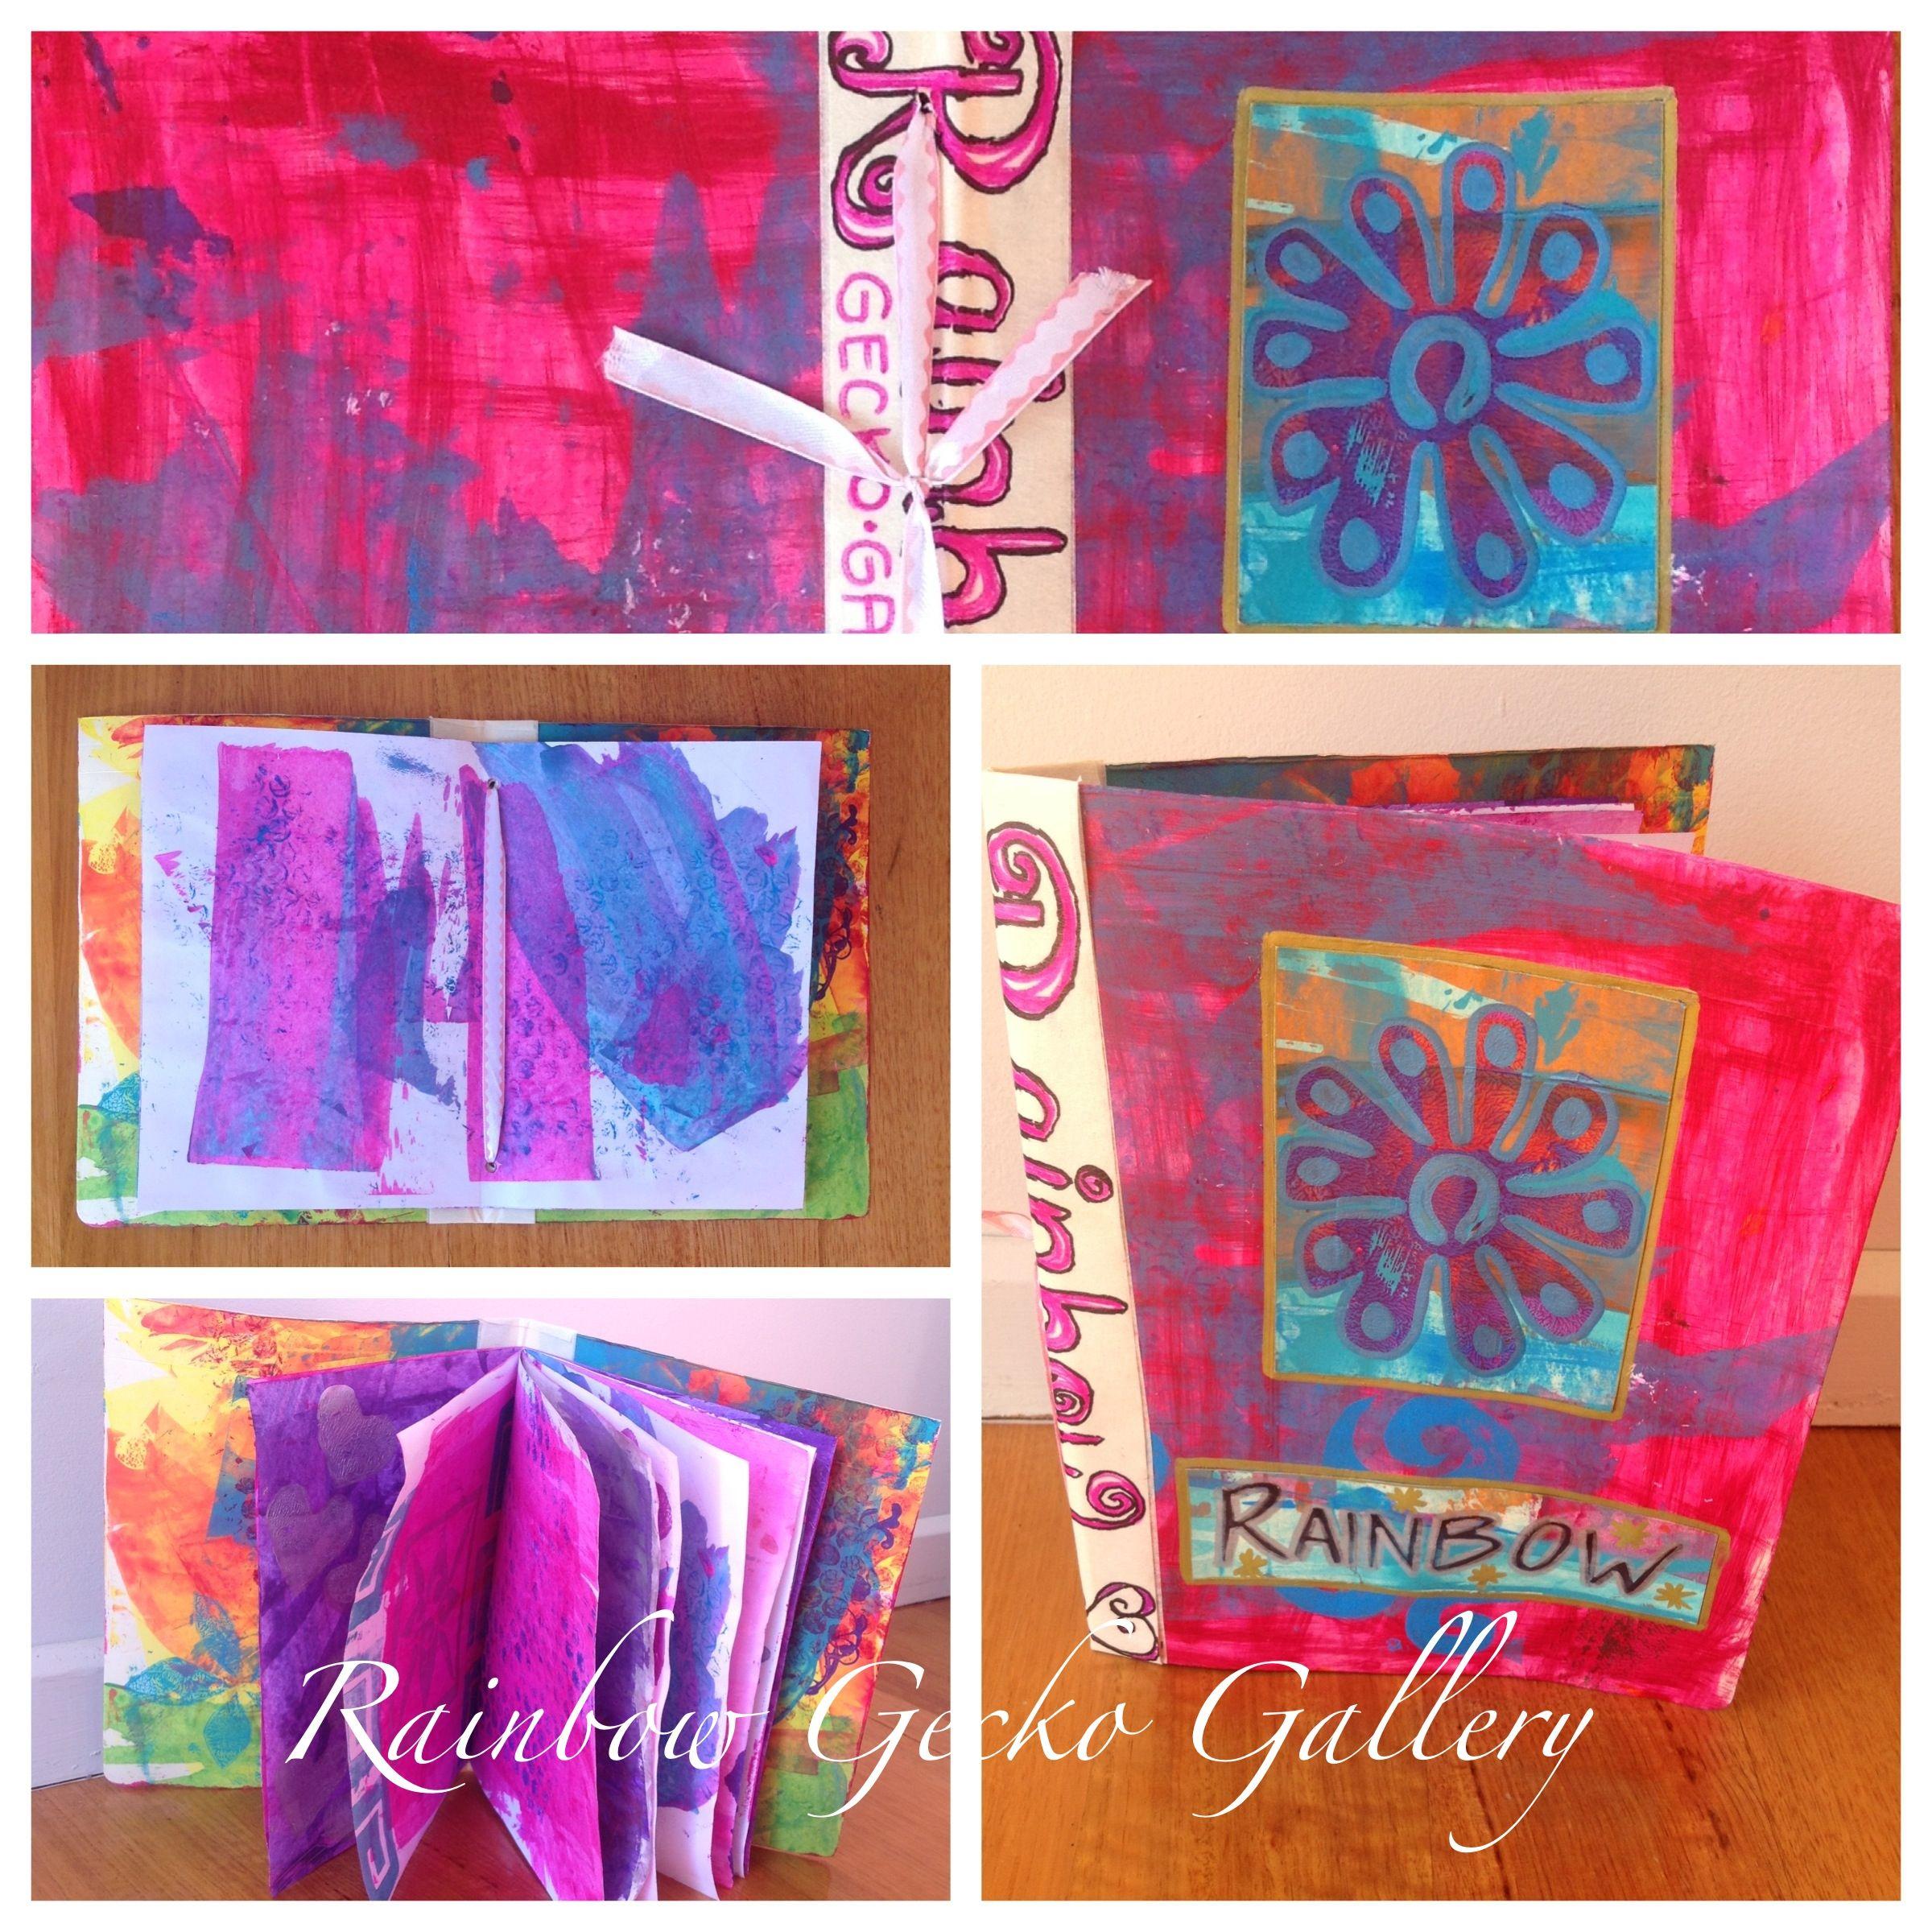 Handmade Art Journal/Notebooks  www.etsy.com/shop/RainbowGeckoGallery